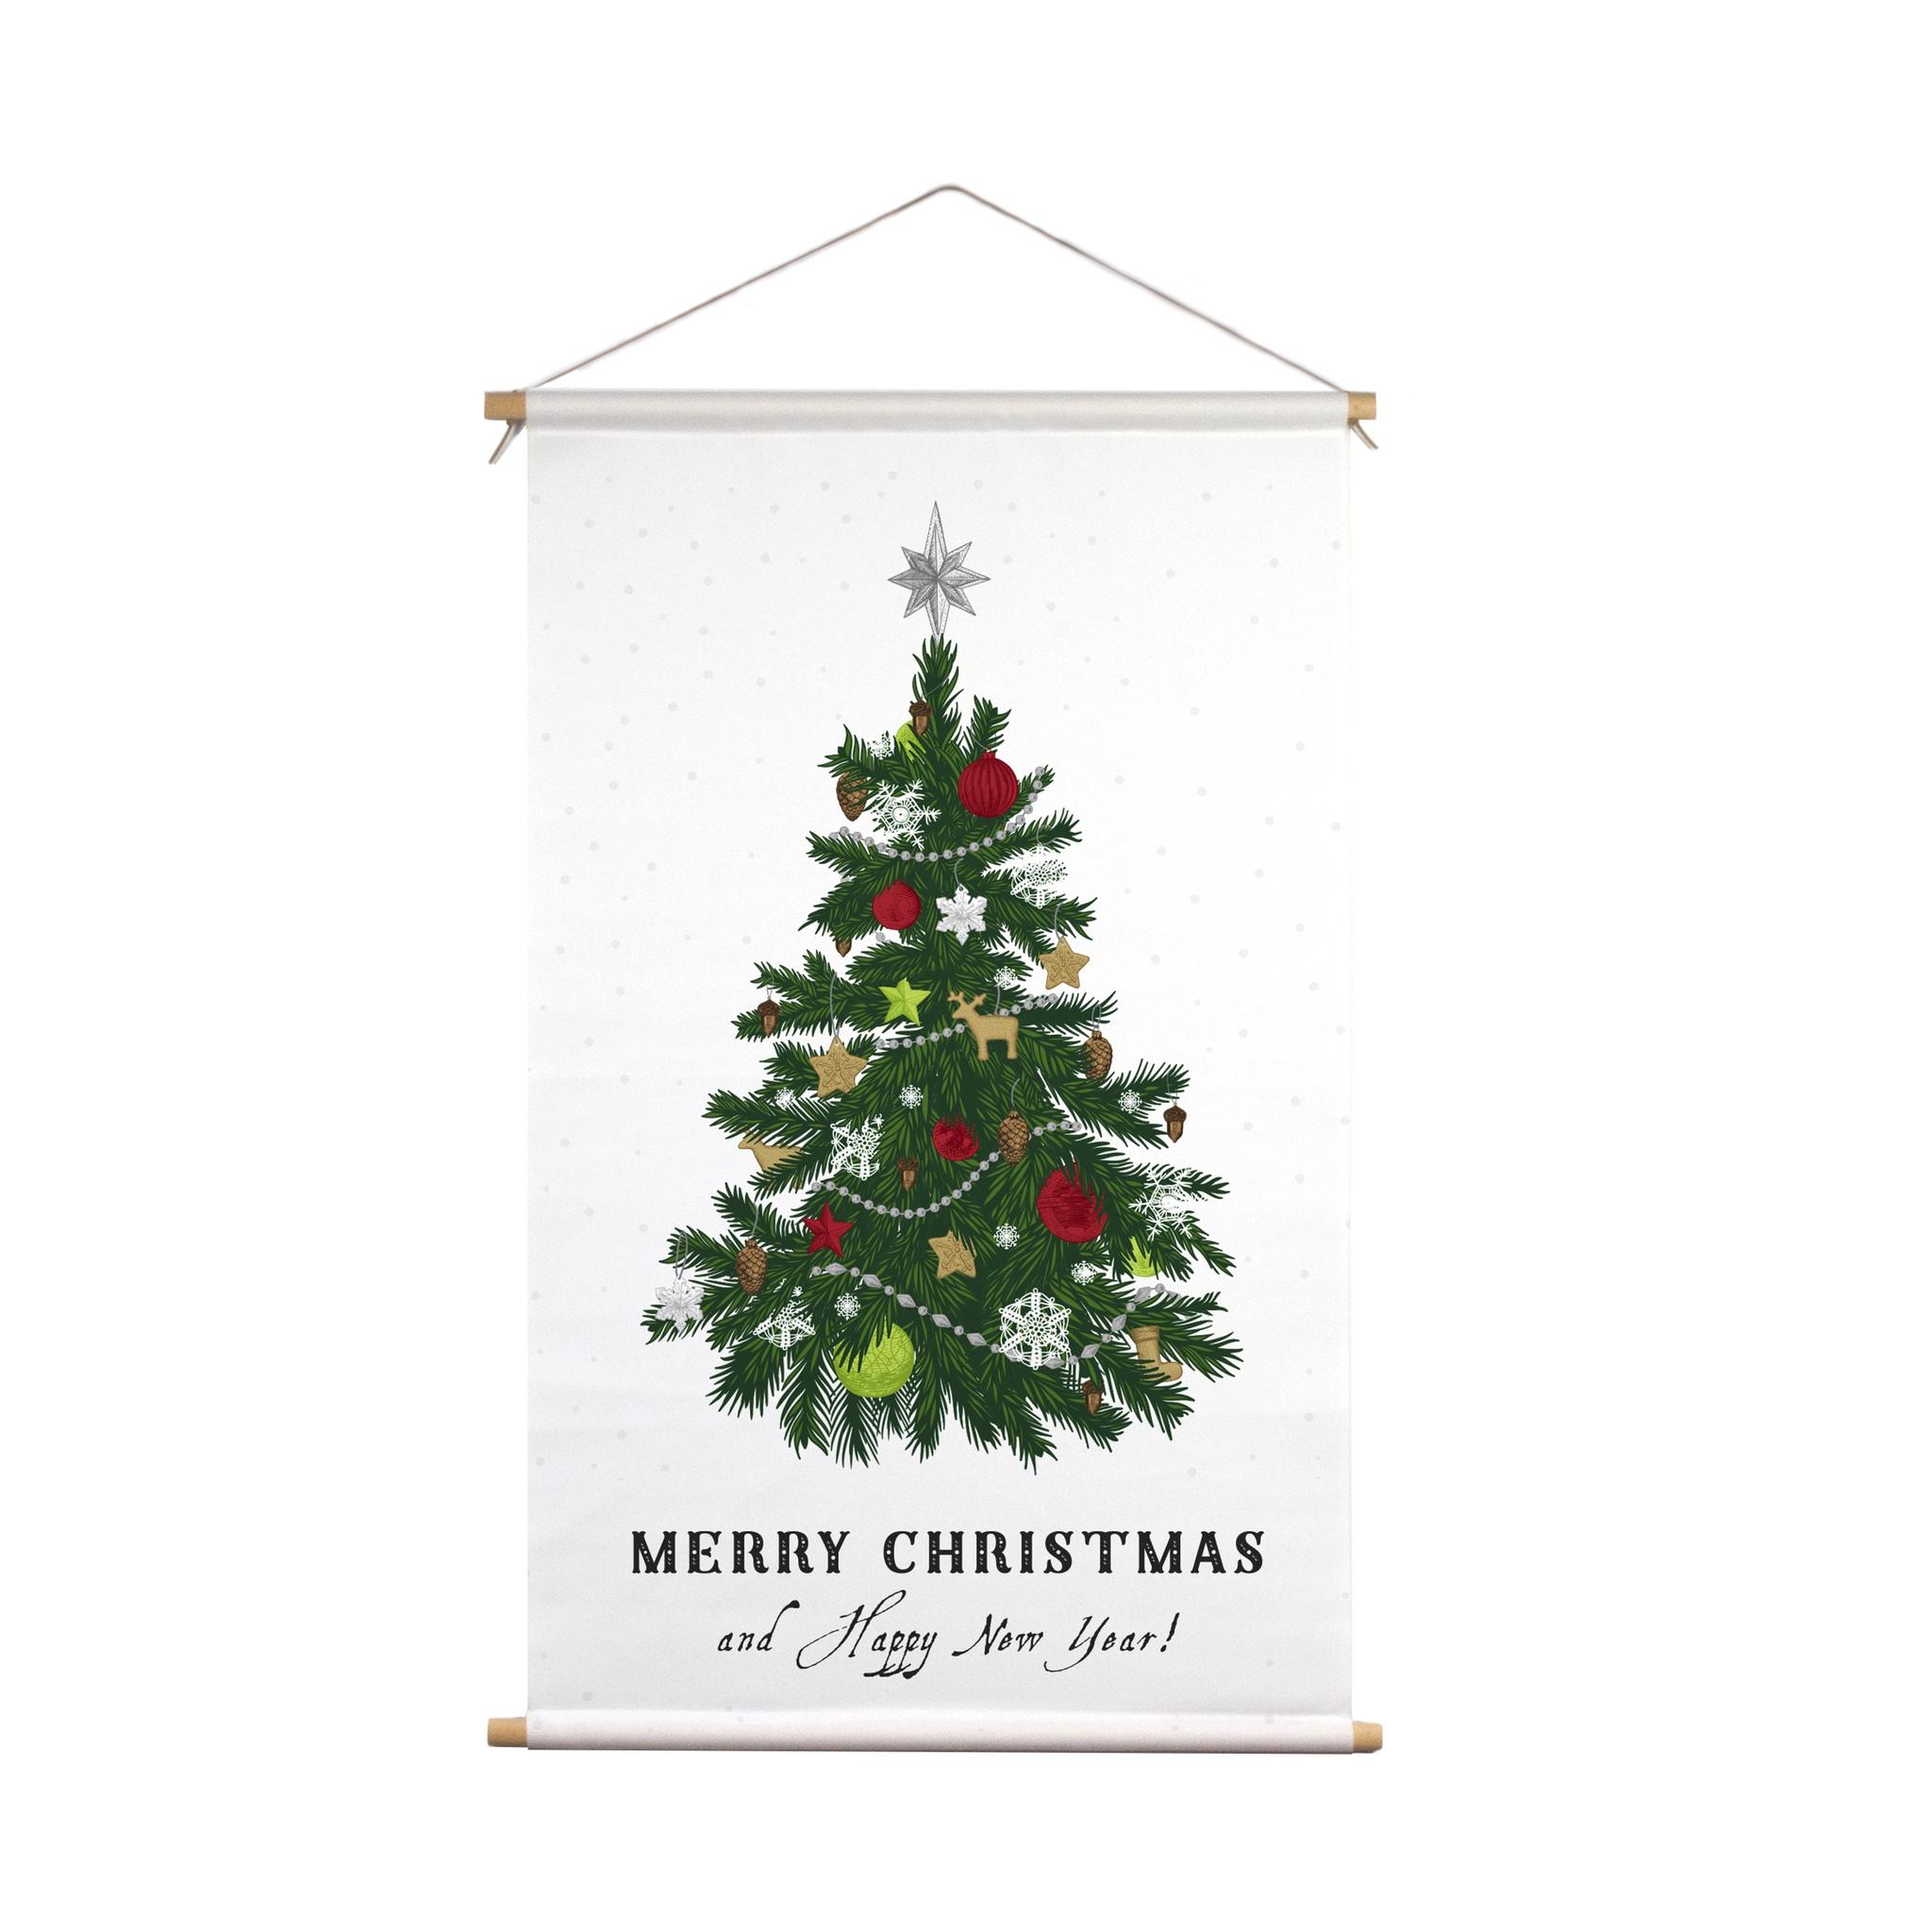 Signcraft-Rotterdam_interieur-textielposter-kerstboom-print